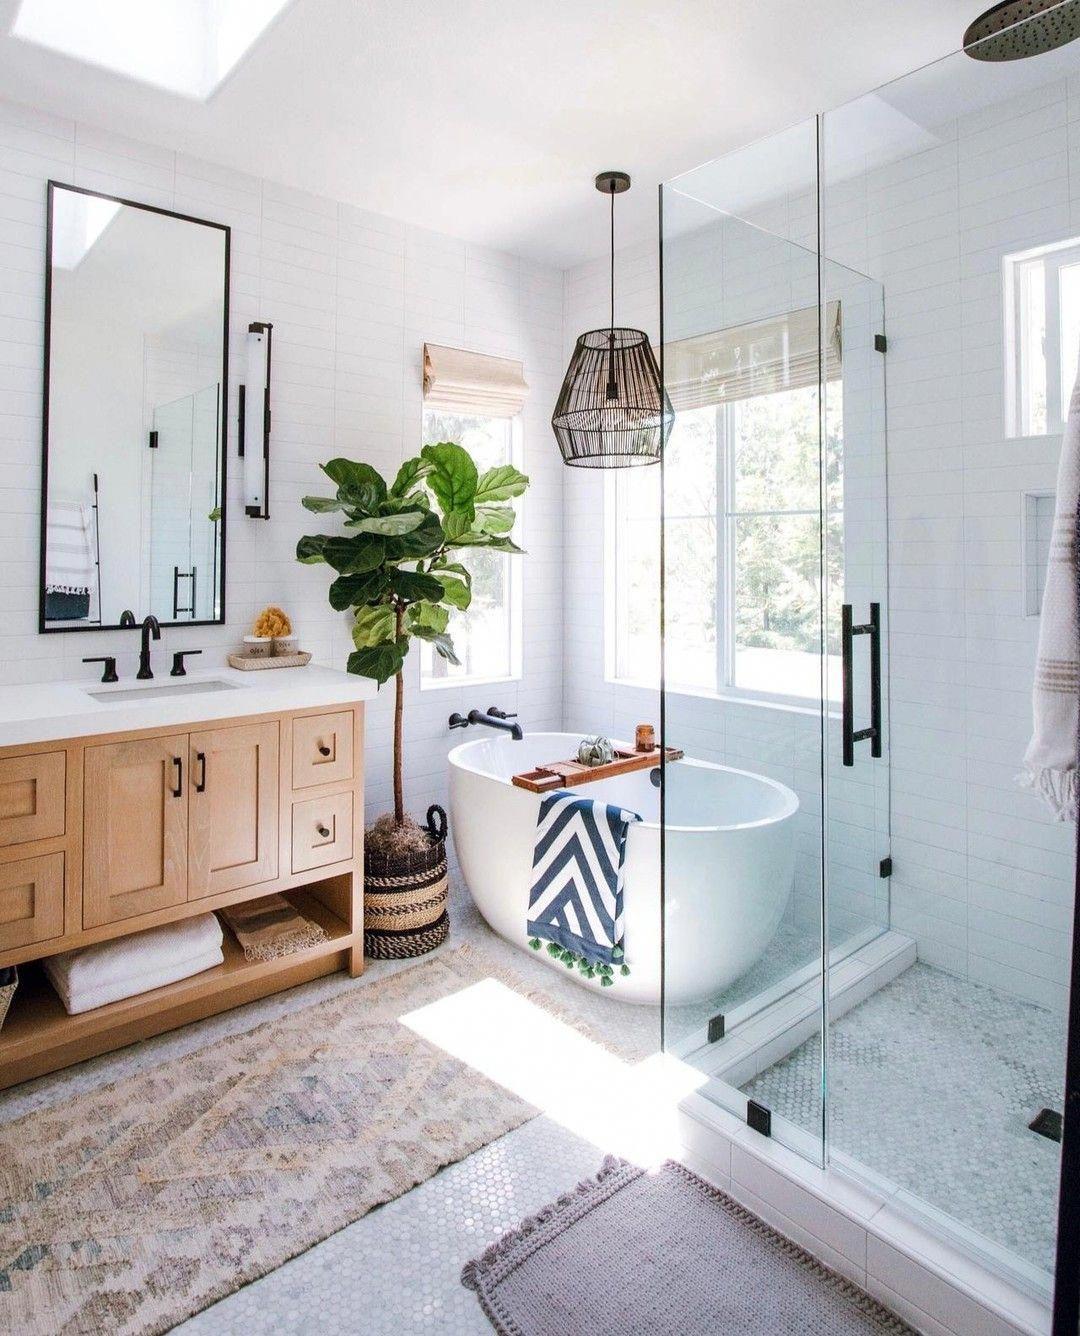 5 Gorgeous Scandinavian Bathroom Ideas: 60 Beautiful And Elegant Modern Bathrooms